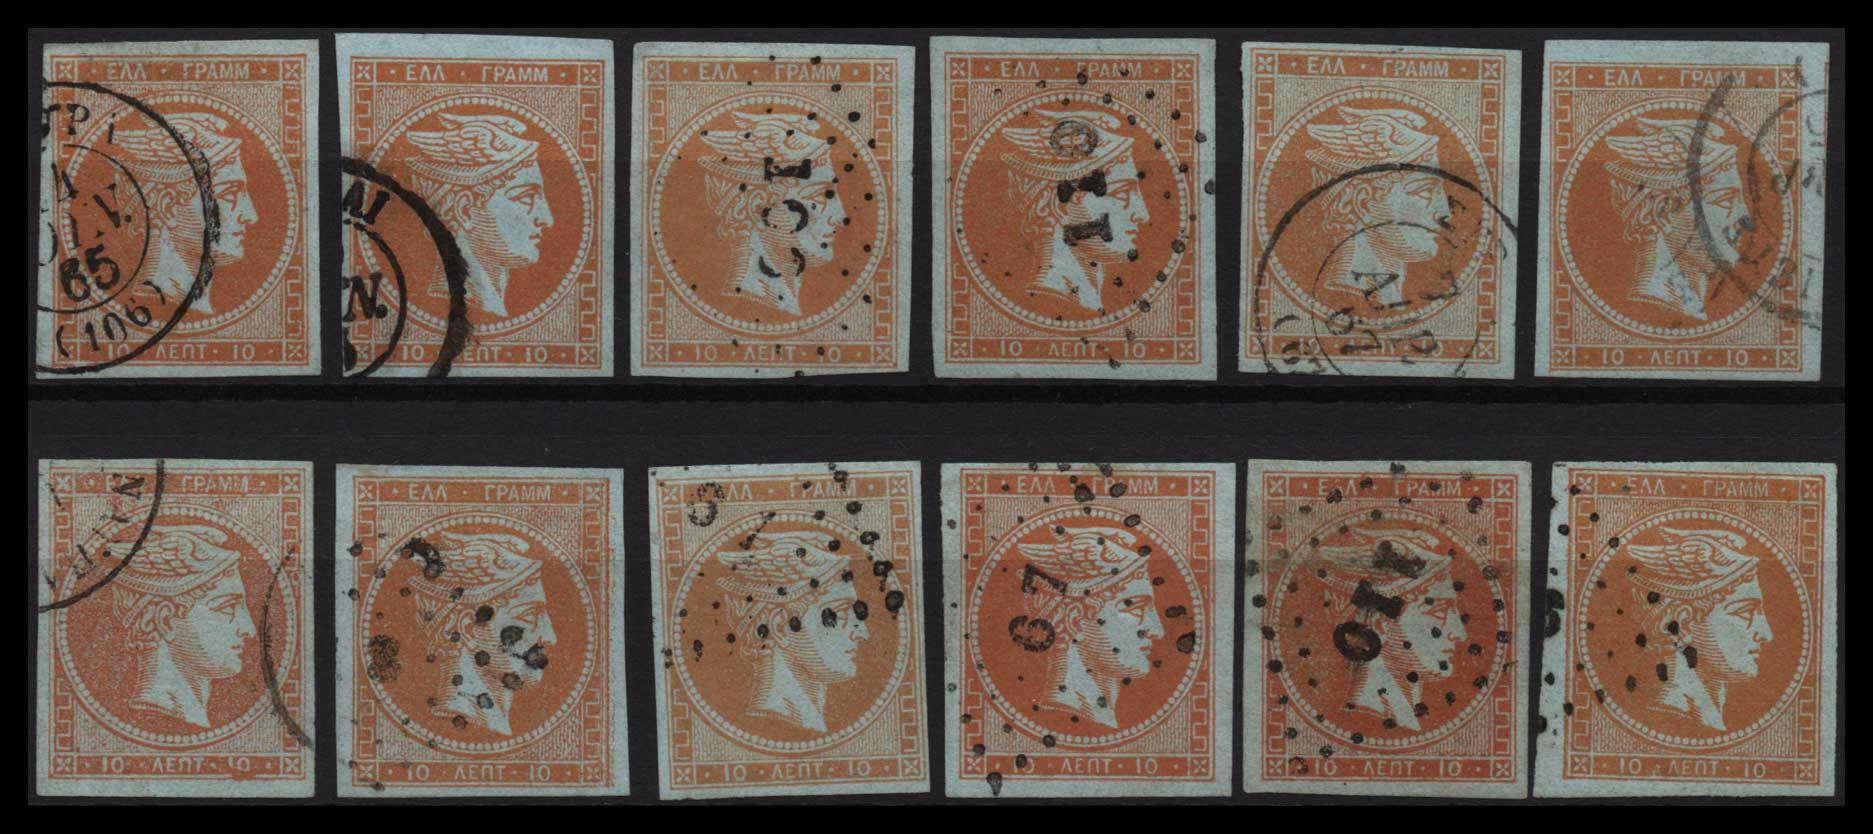 Lot 22 - -  LARGE HERMES HEAD large hermes head -  Athens Auctions Public Auction 83 General Stamp Sale